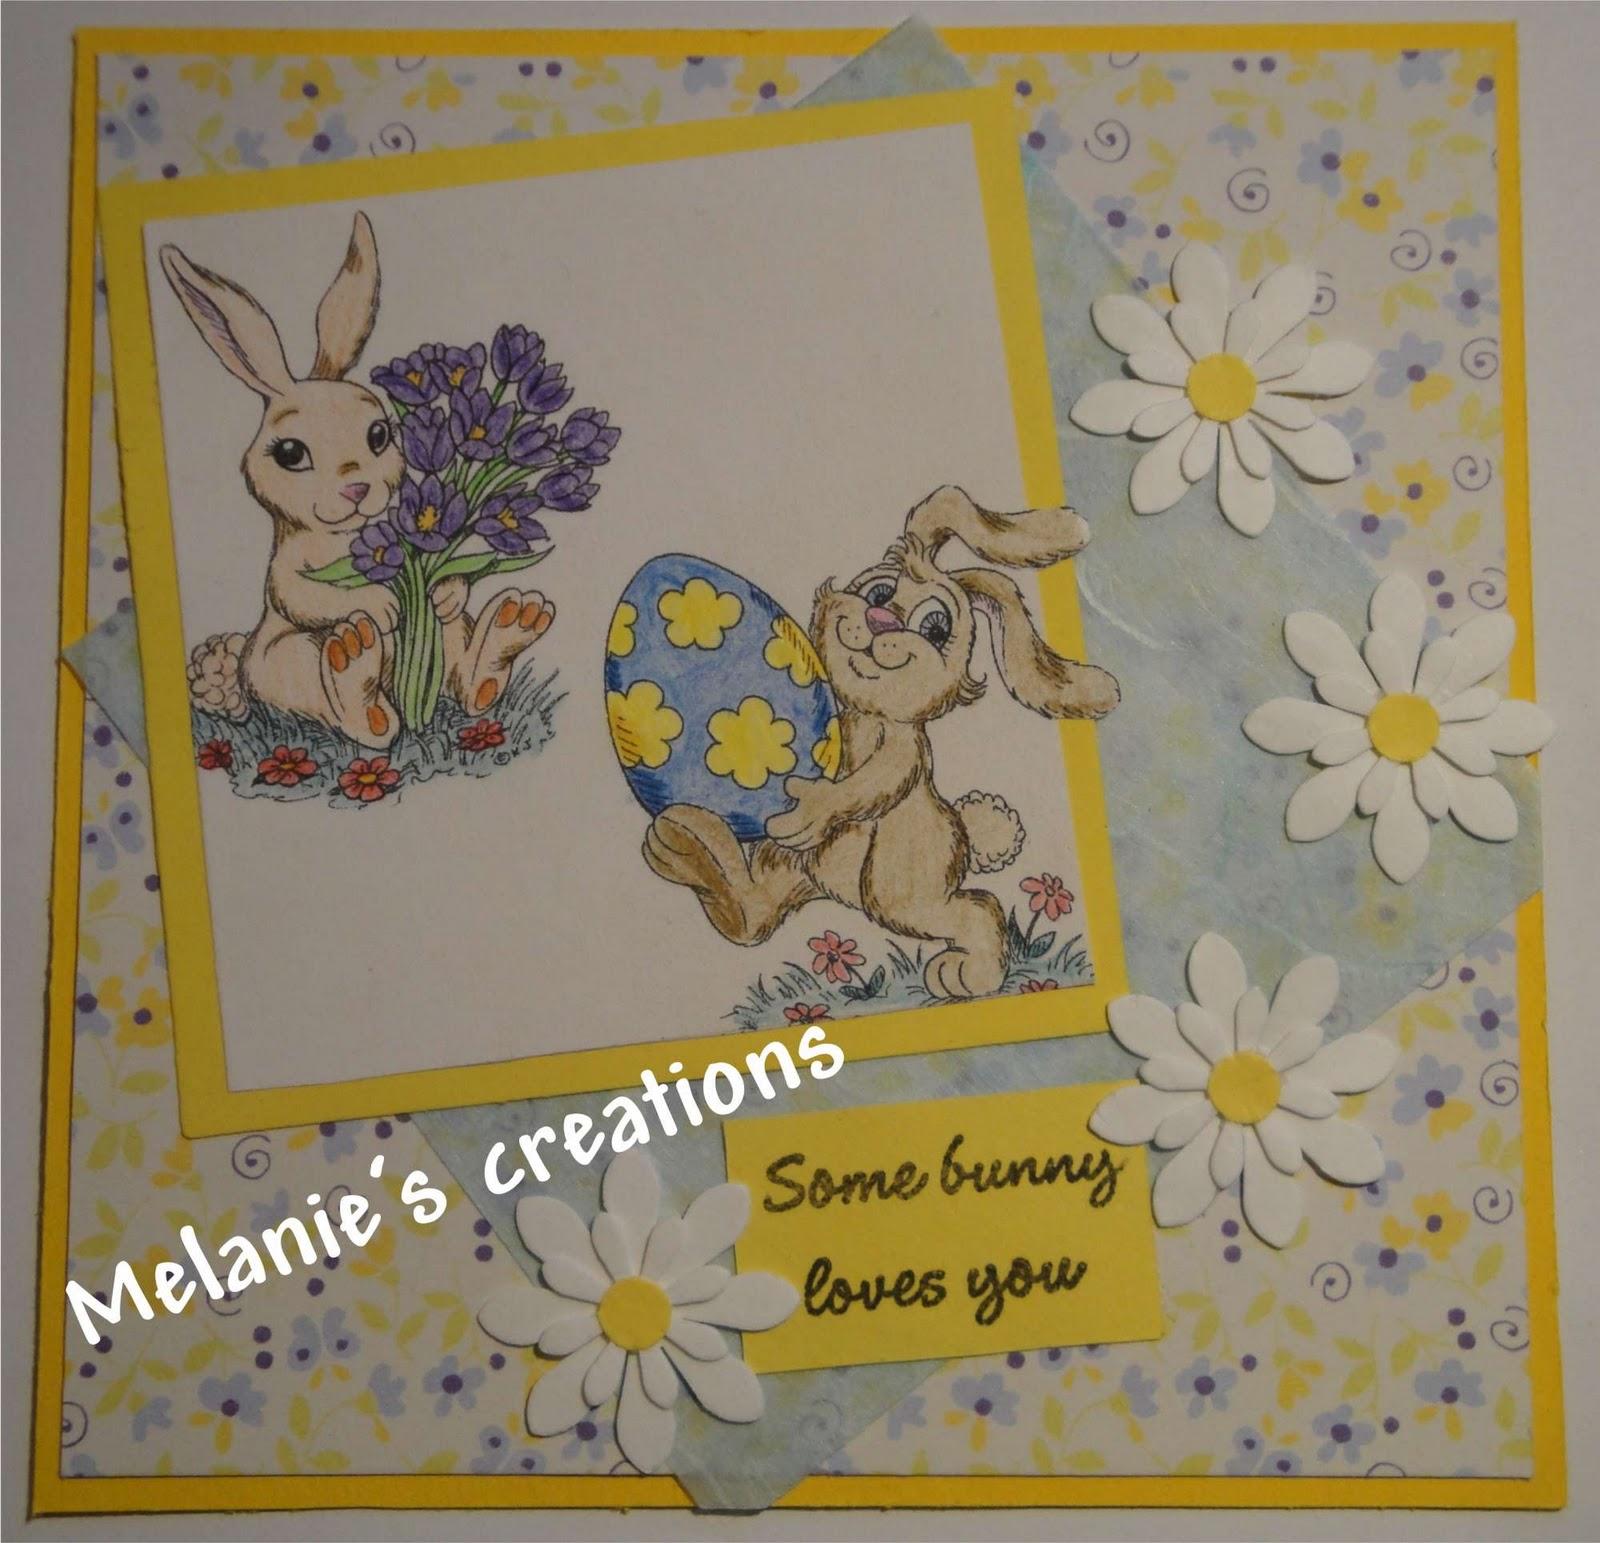 http://4.bp.blogspot.com/-S4S50Zbuh0A/TZn1PIRz3xI/AAAAAAAAAJ8/o0h9sCF0hUA/s1600/48+Easter+bunnies-2000.jpg